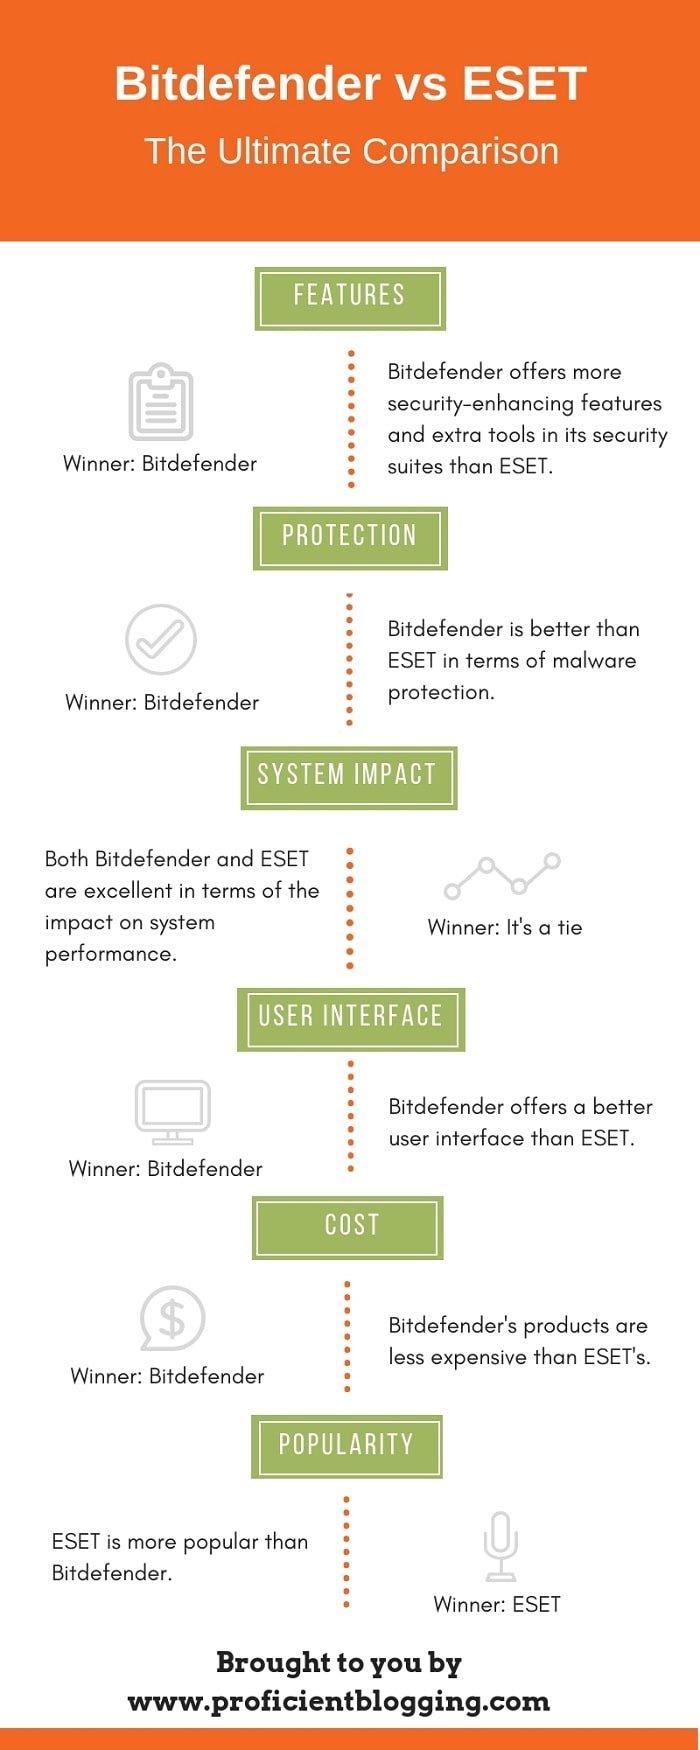 Bitdefender Vs ESET 2019 | Ultimate Comparison [New Results]